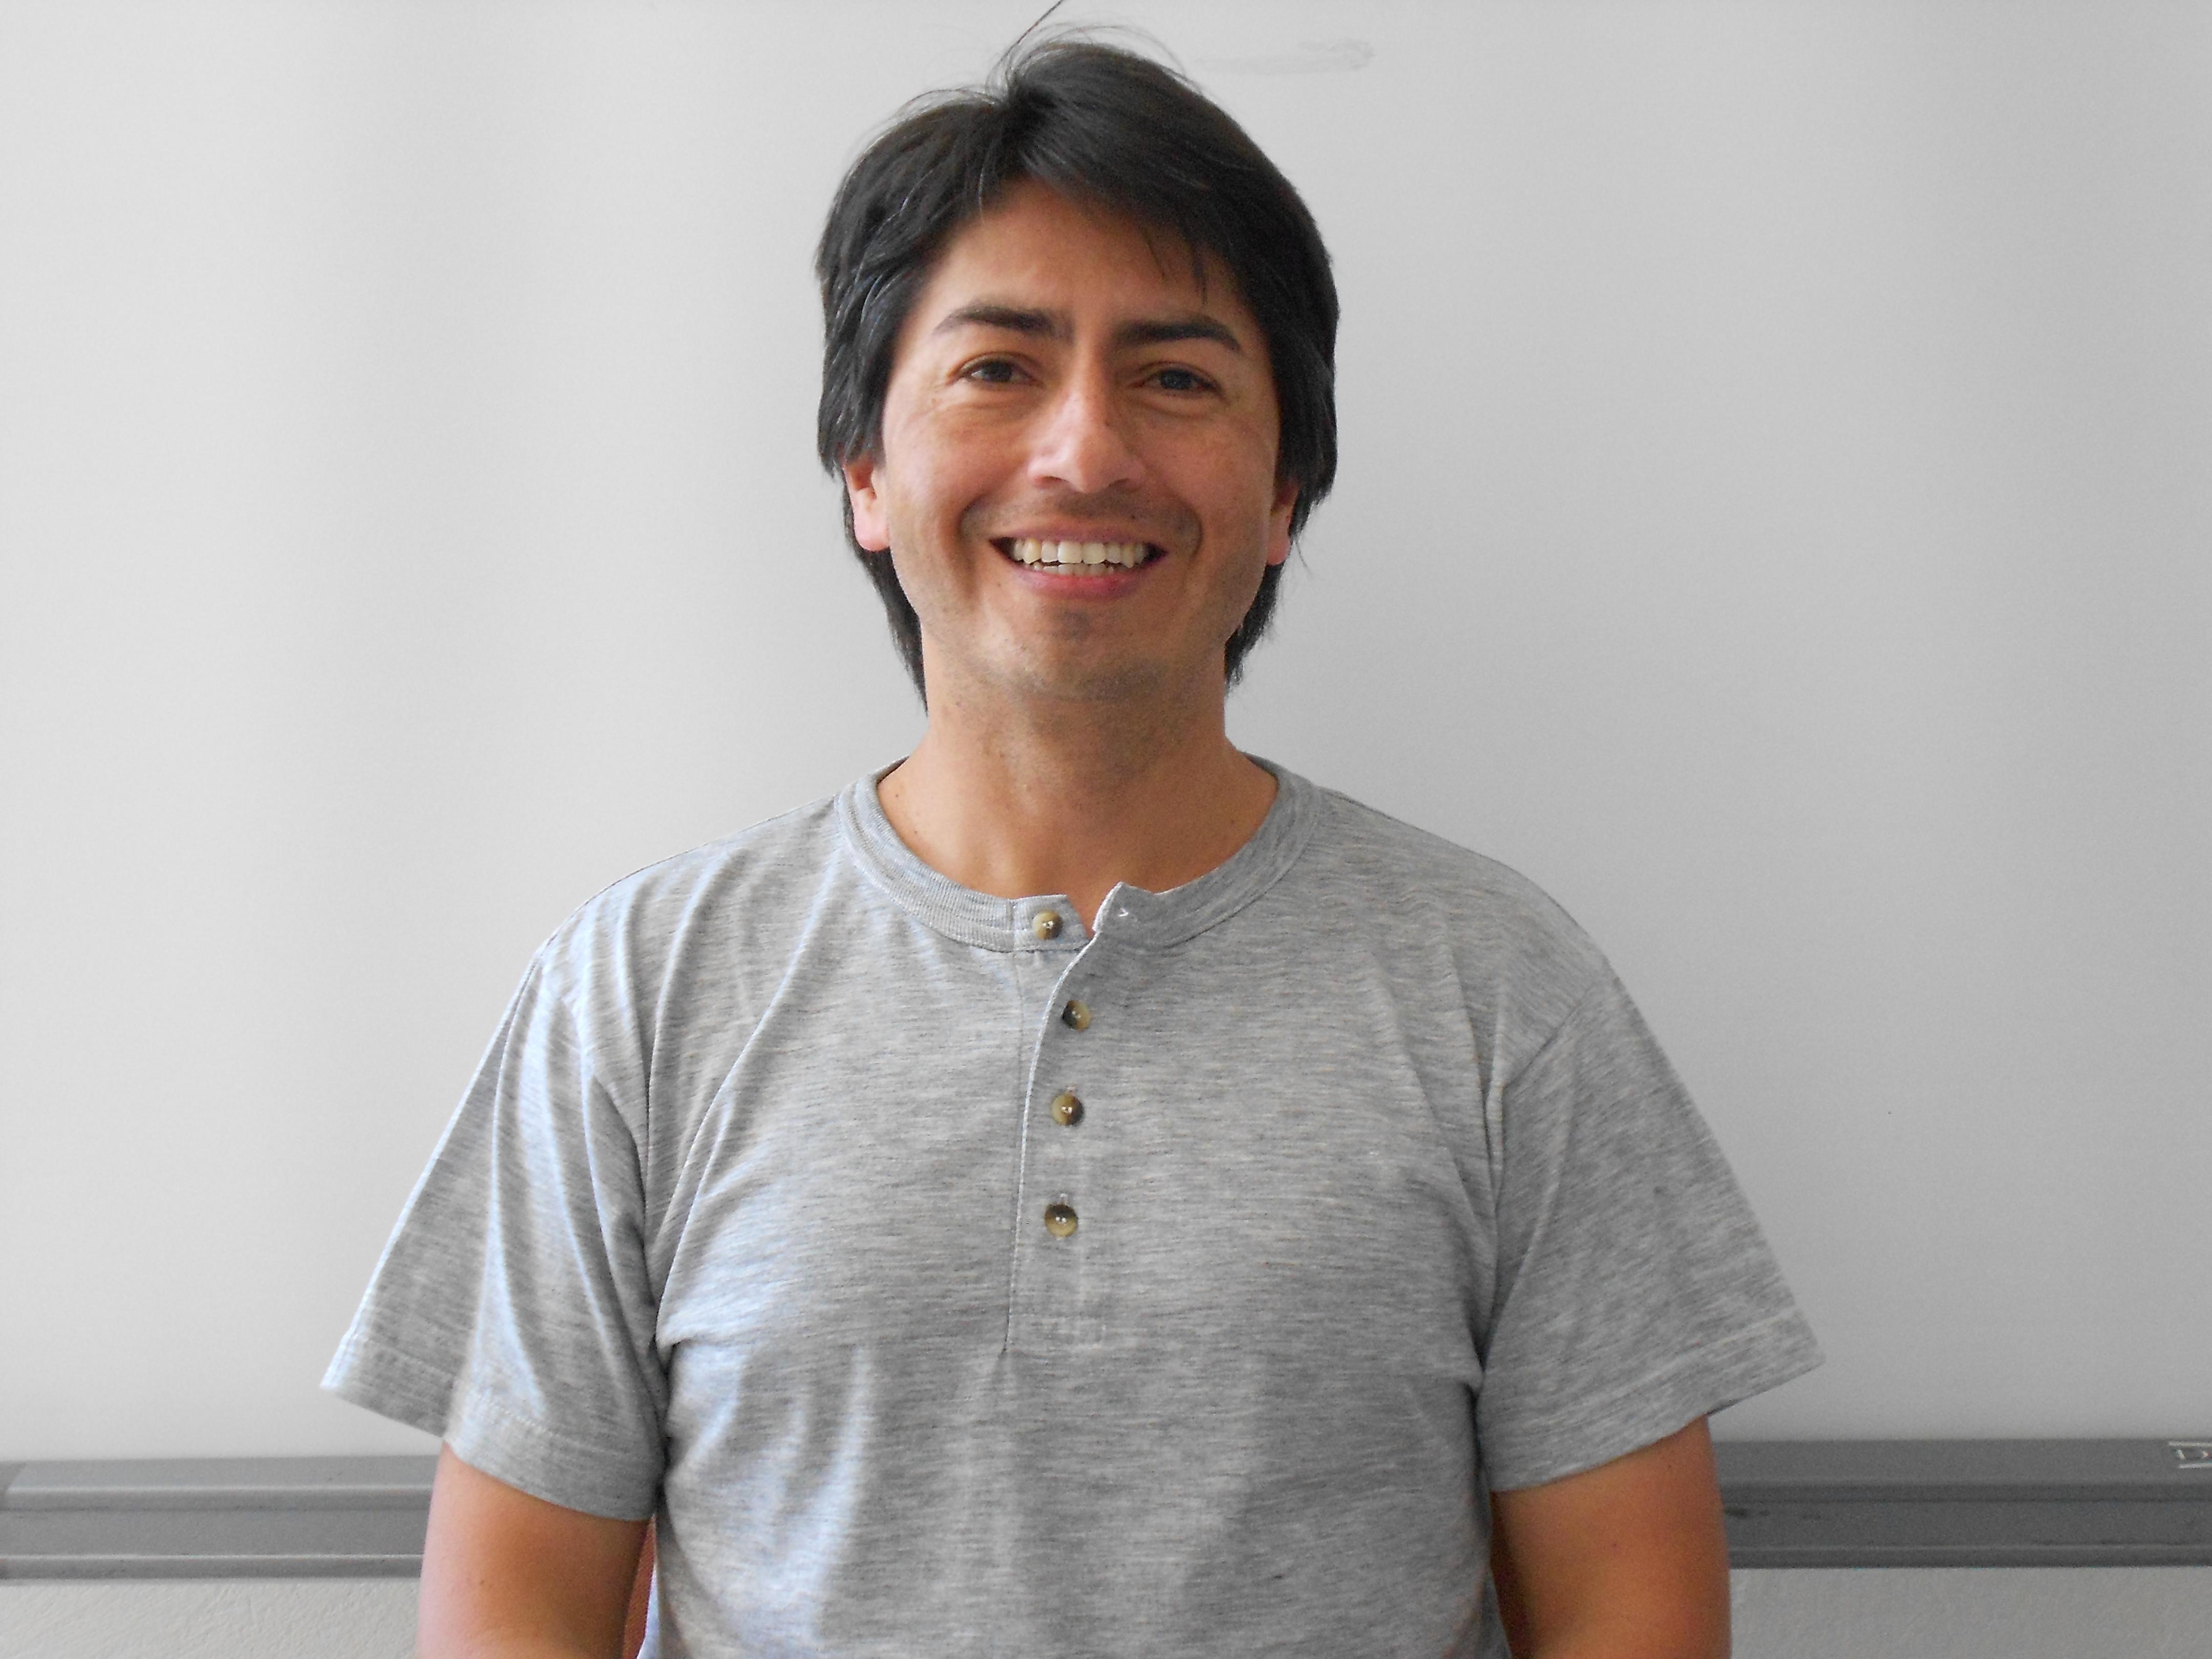 Óscar Andrés Eraso Eraso